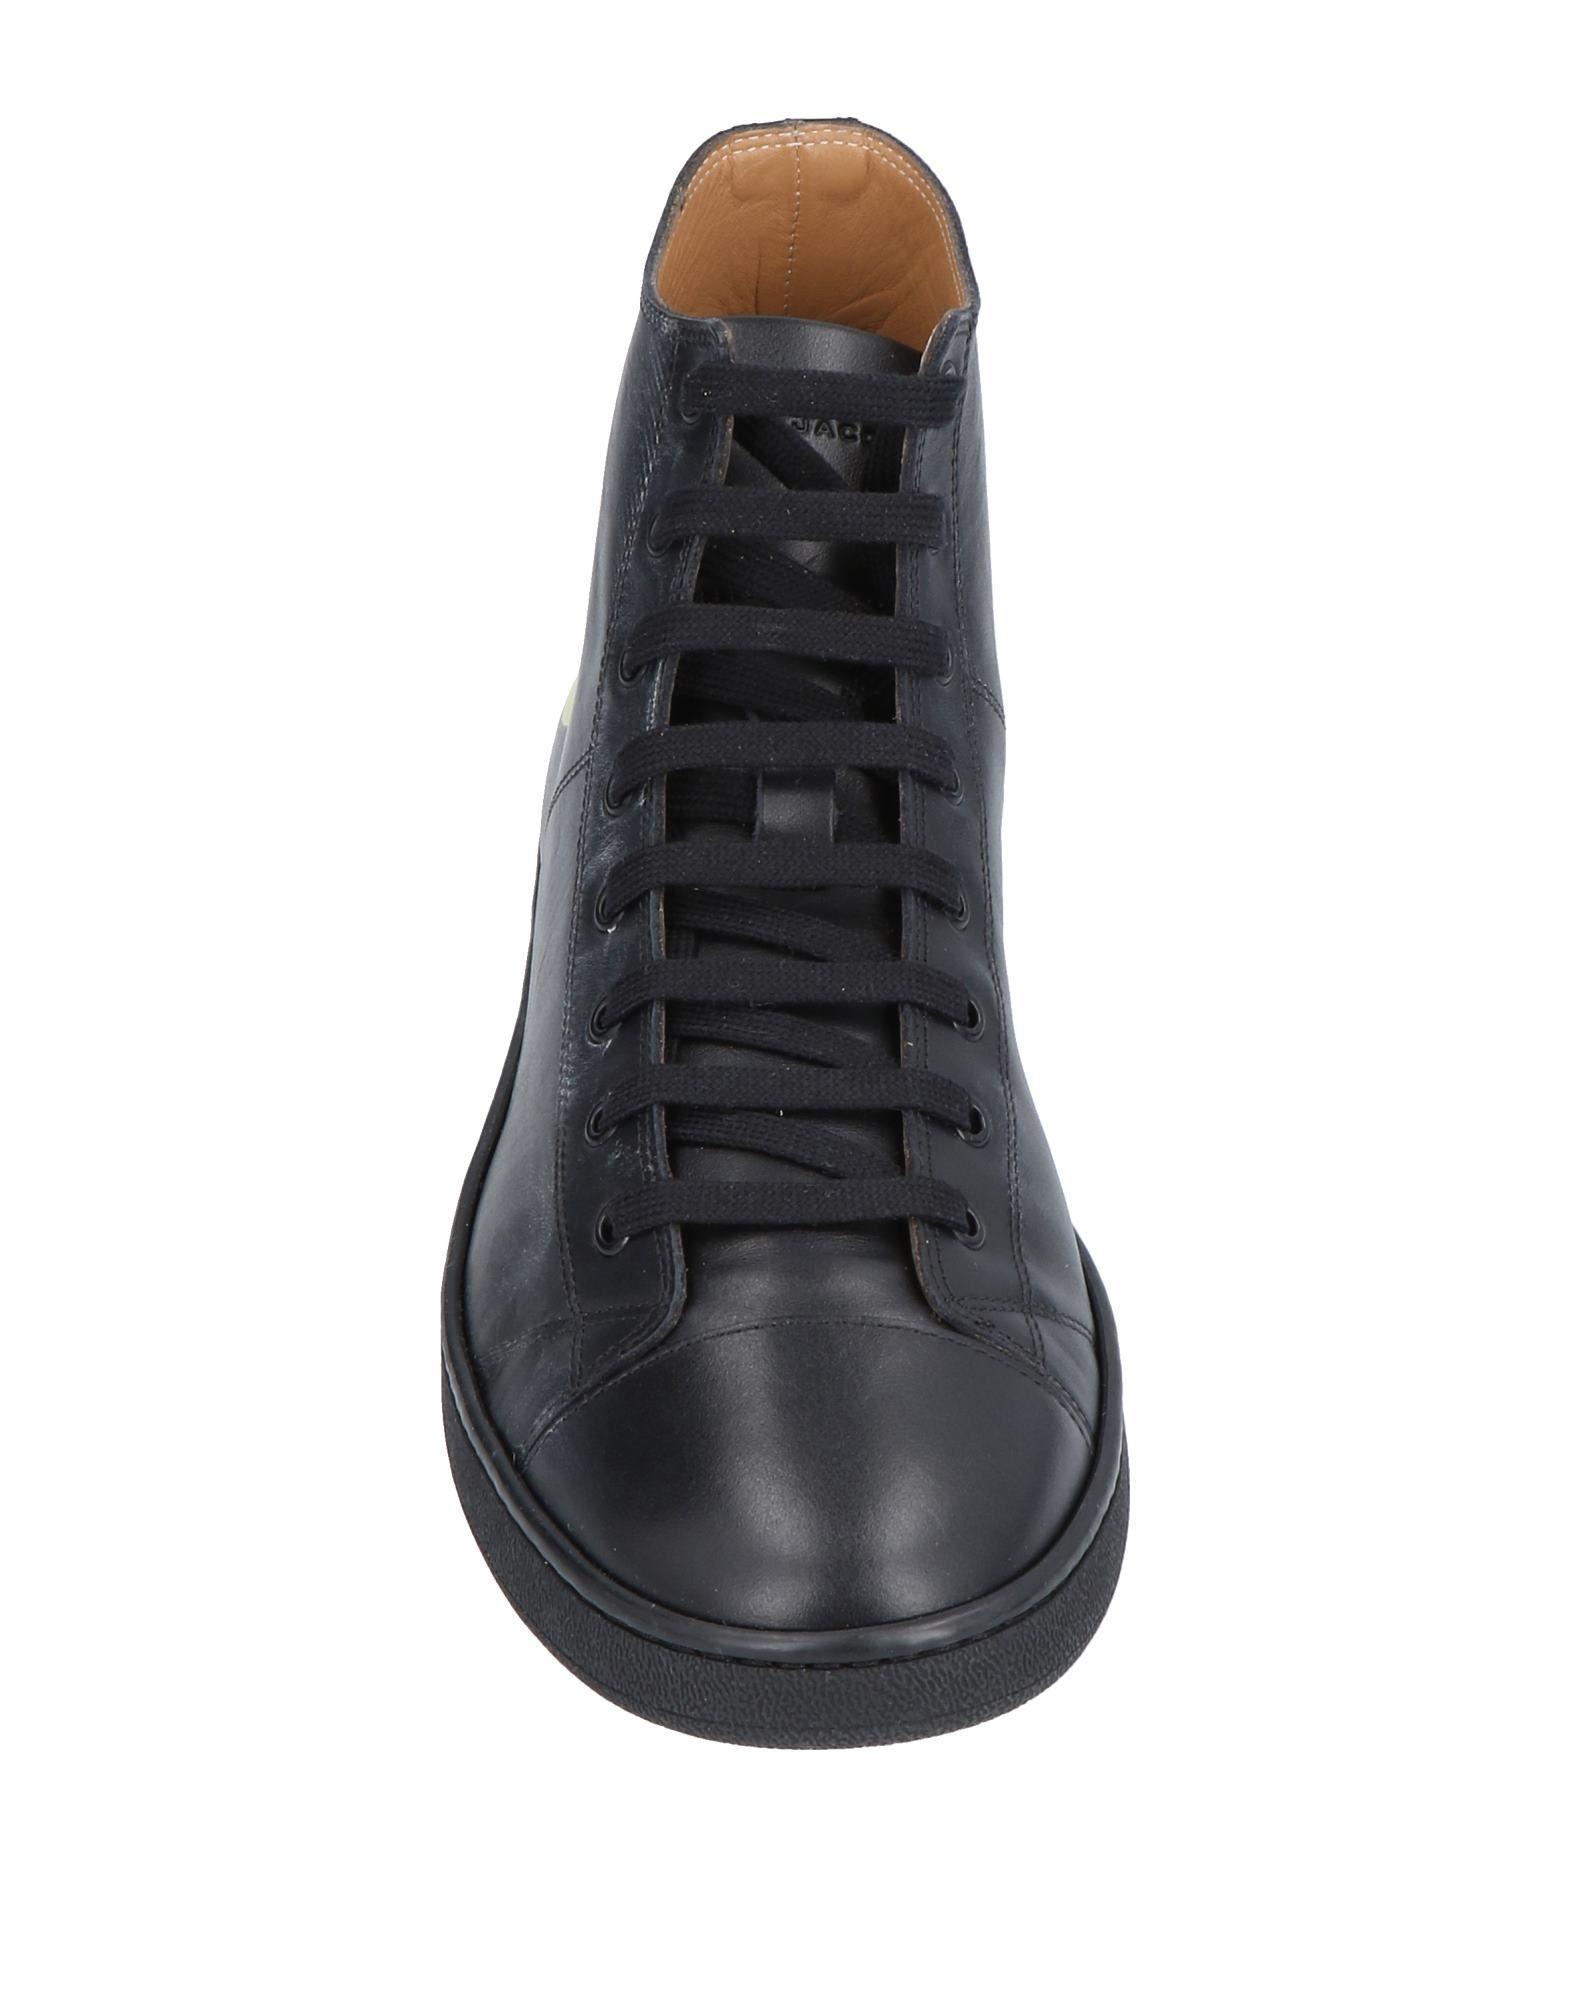 amp; Men Jacobs For Lyst Marc Tops High In Sneakers Black qCx4wva